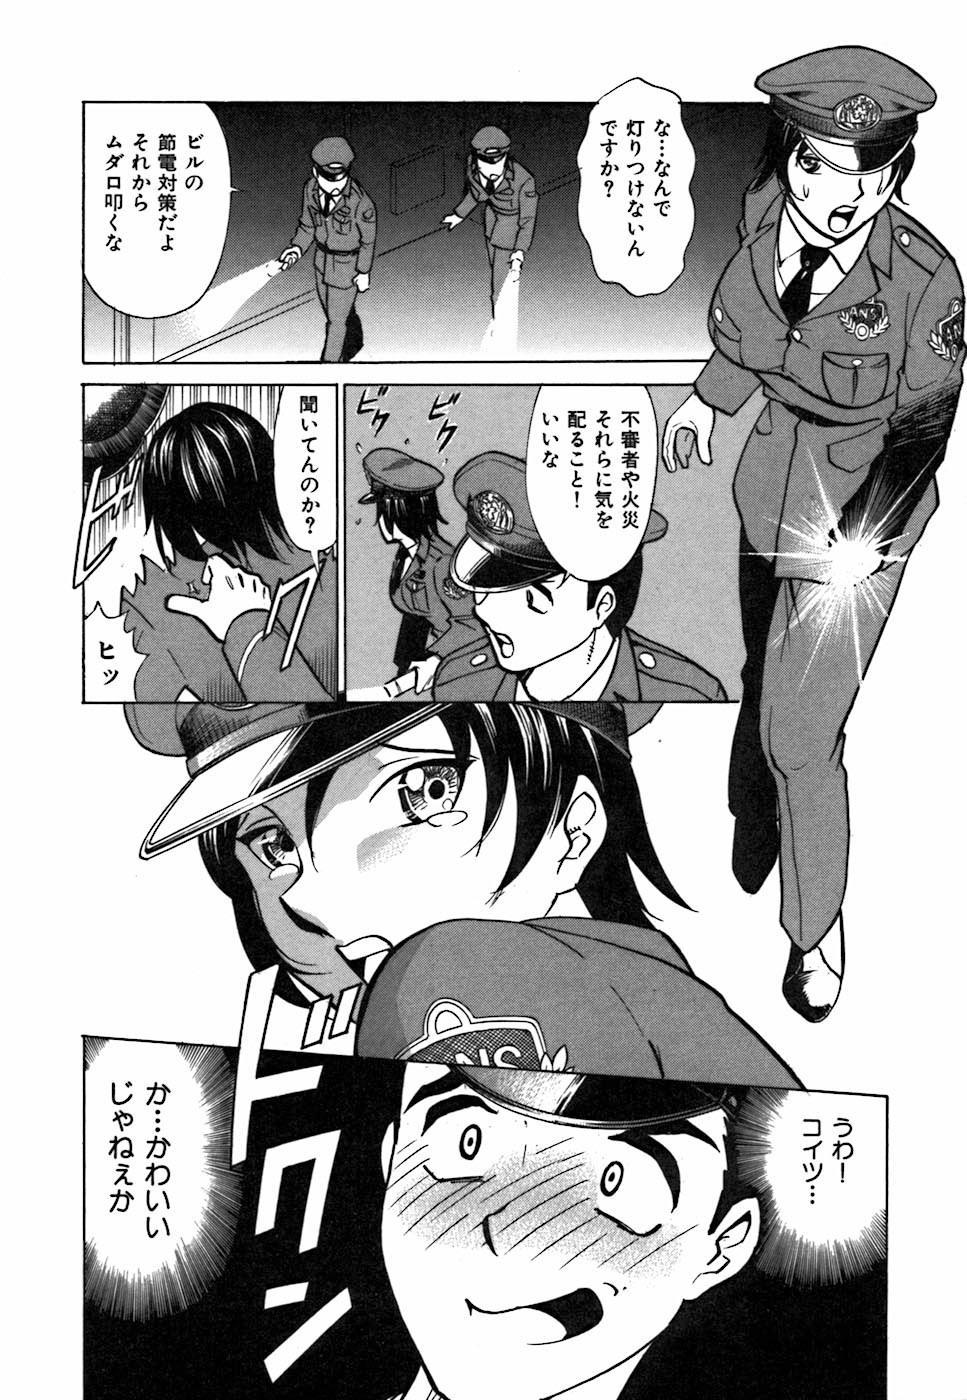 Kimi ga Nozomu Katachi | Appearance for which you hope 111